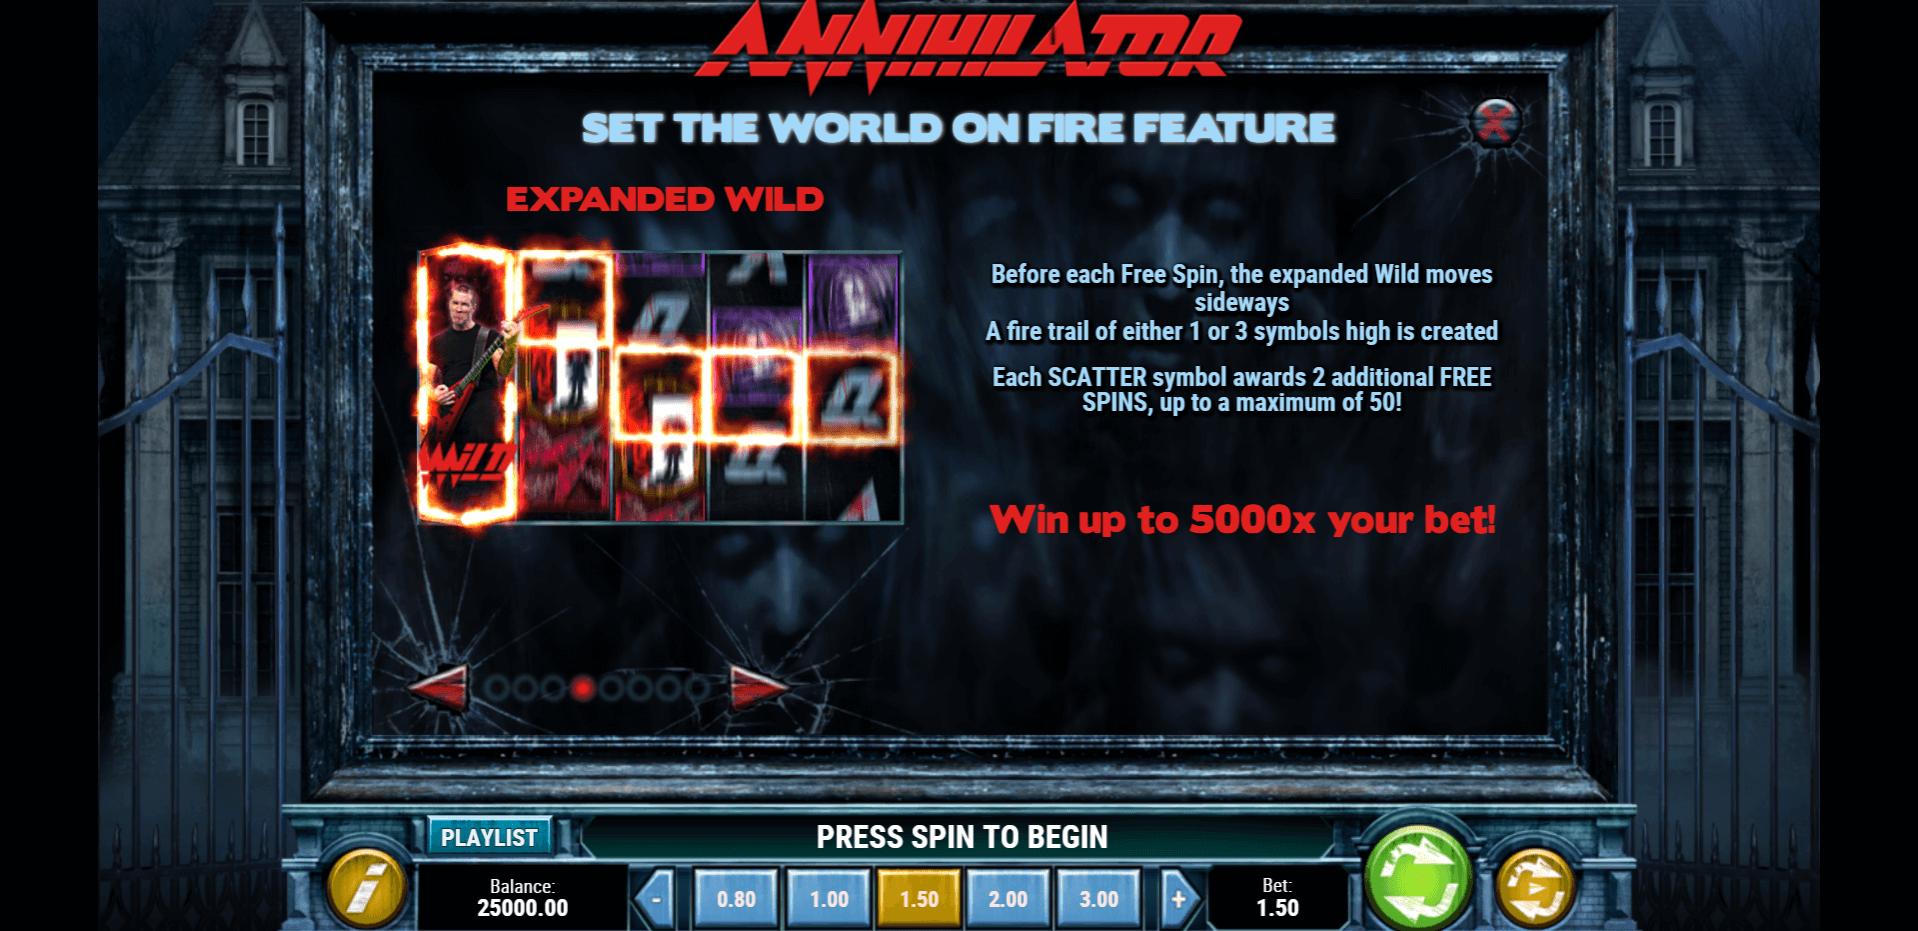 Annihilator Slot Machine